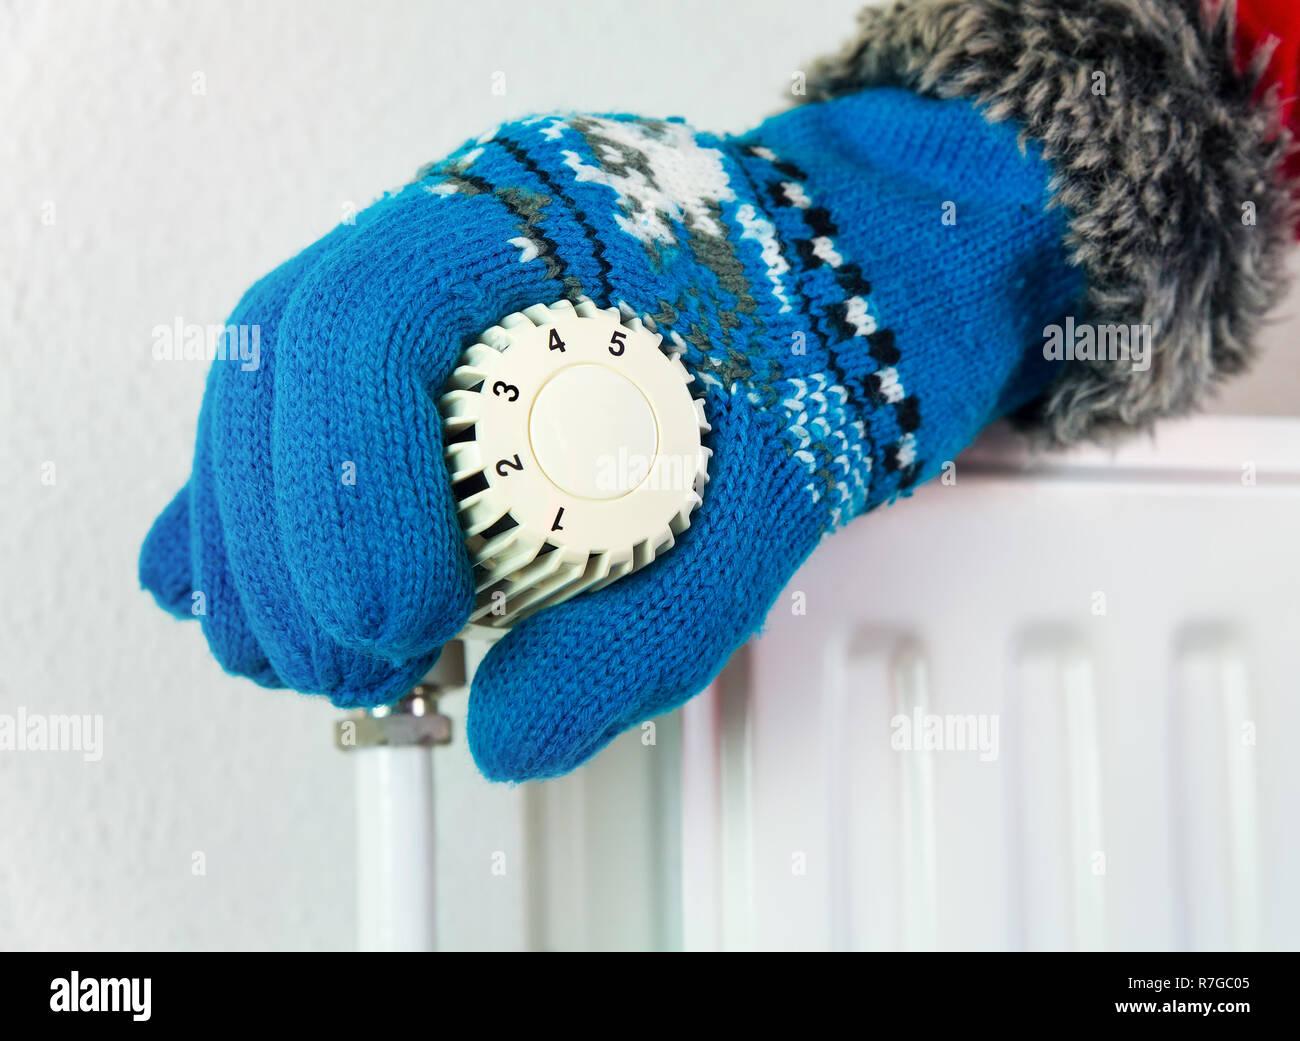 Hand Warmer Stock Photos Amp Hand Warmer Stock Images Alamy